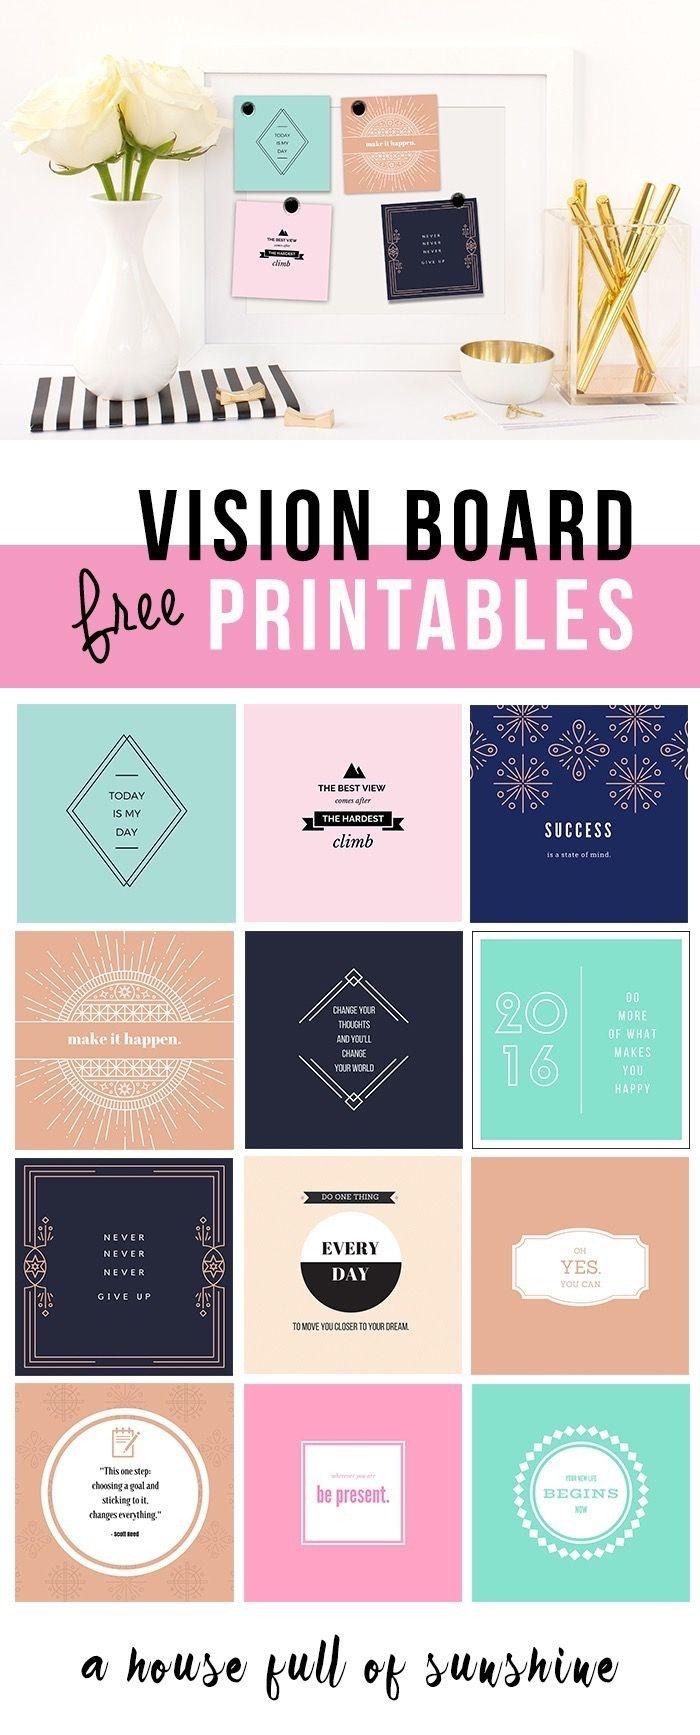 Free Vision Board Printables #247Moms | Free Printables | Goal Board - Free Vision Board Printables Pdf